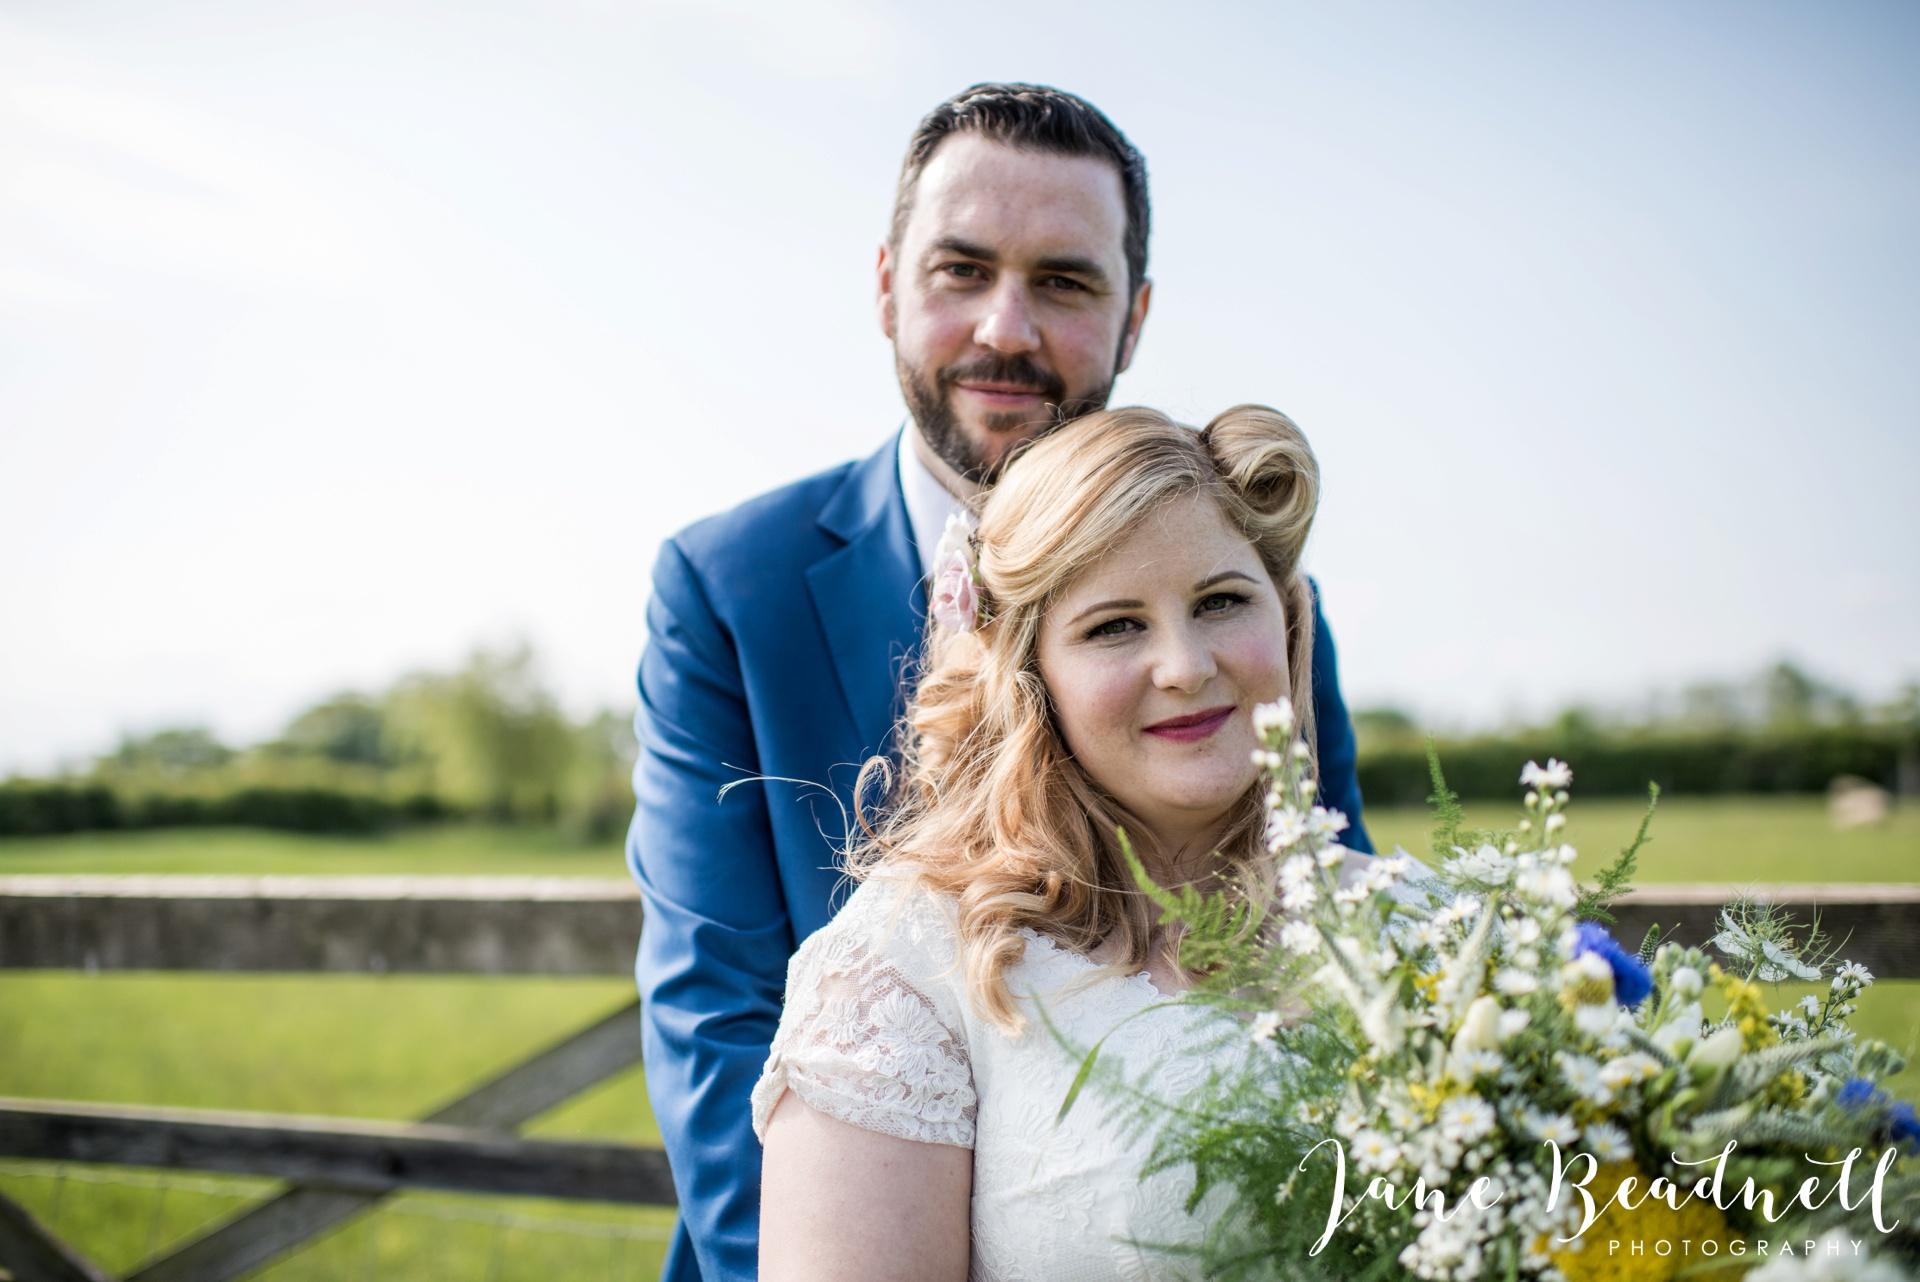 South Farm Wedding photography Hertfordshire by Jane Beadnell Photography fine art wedding photographer_0127